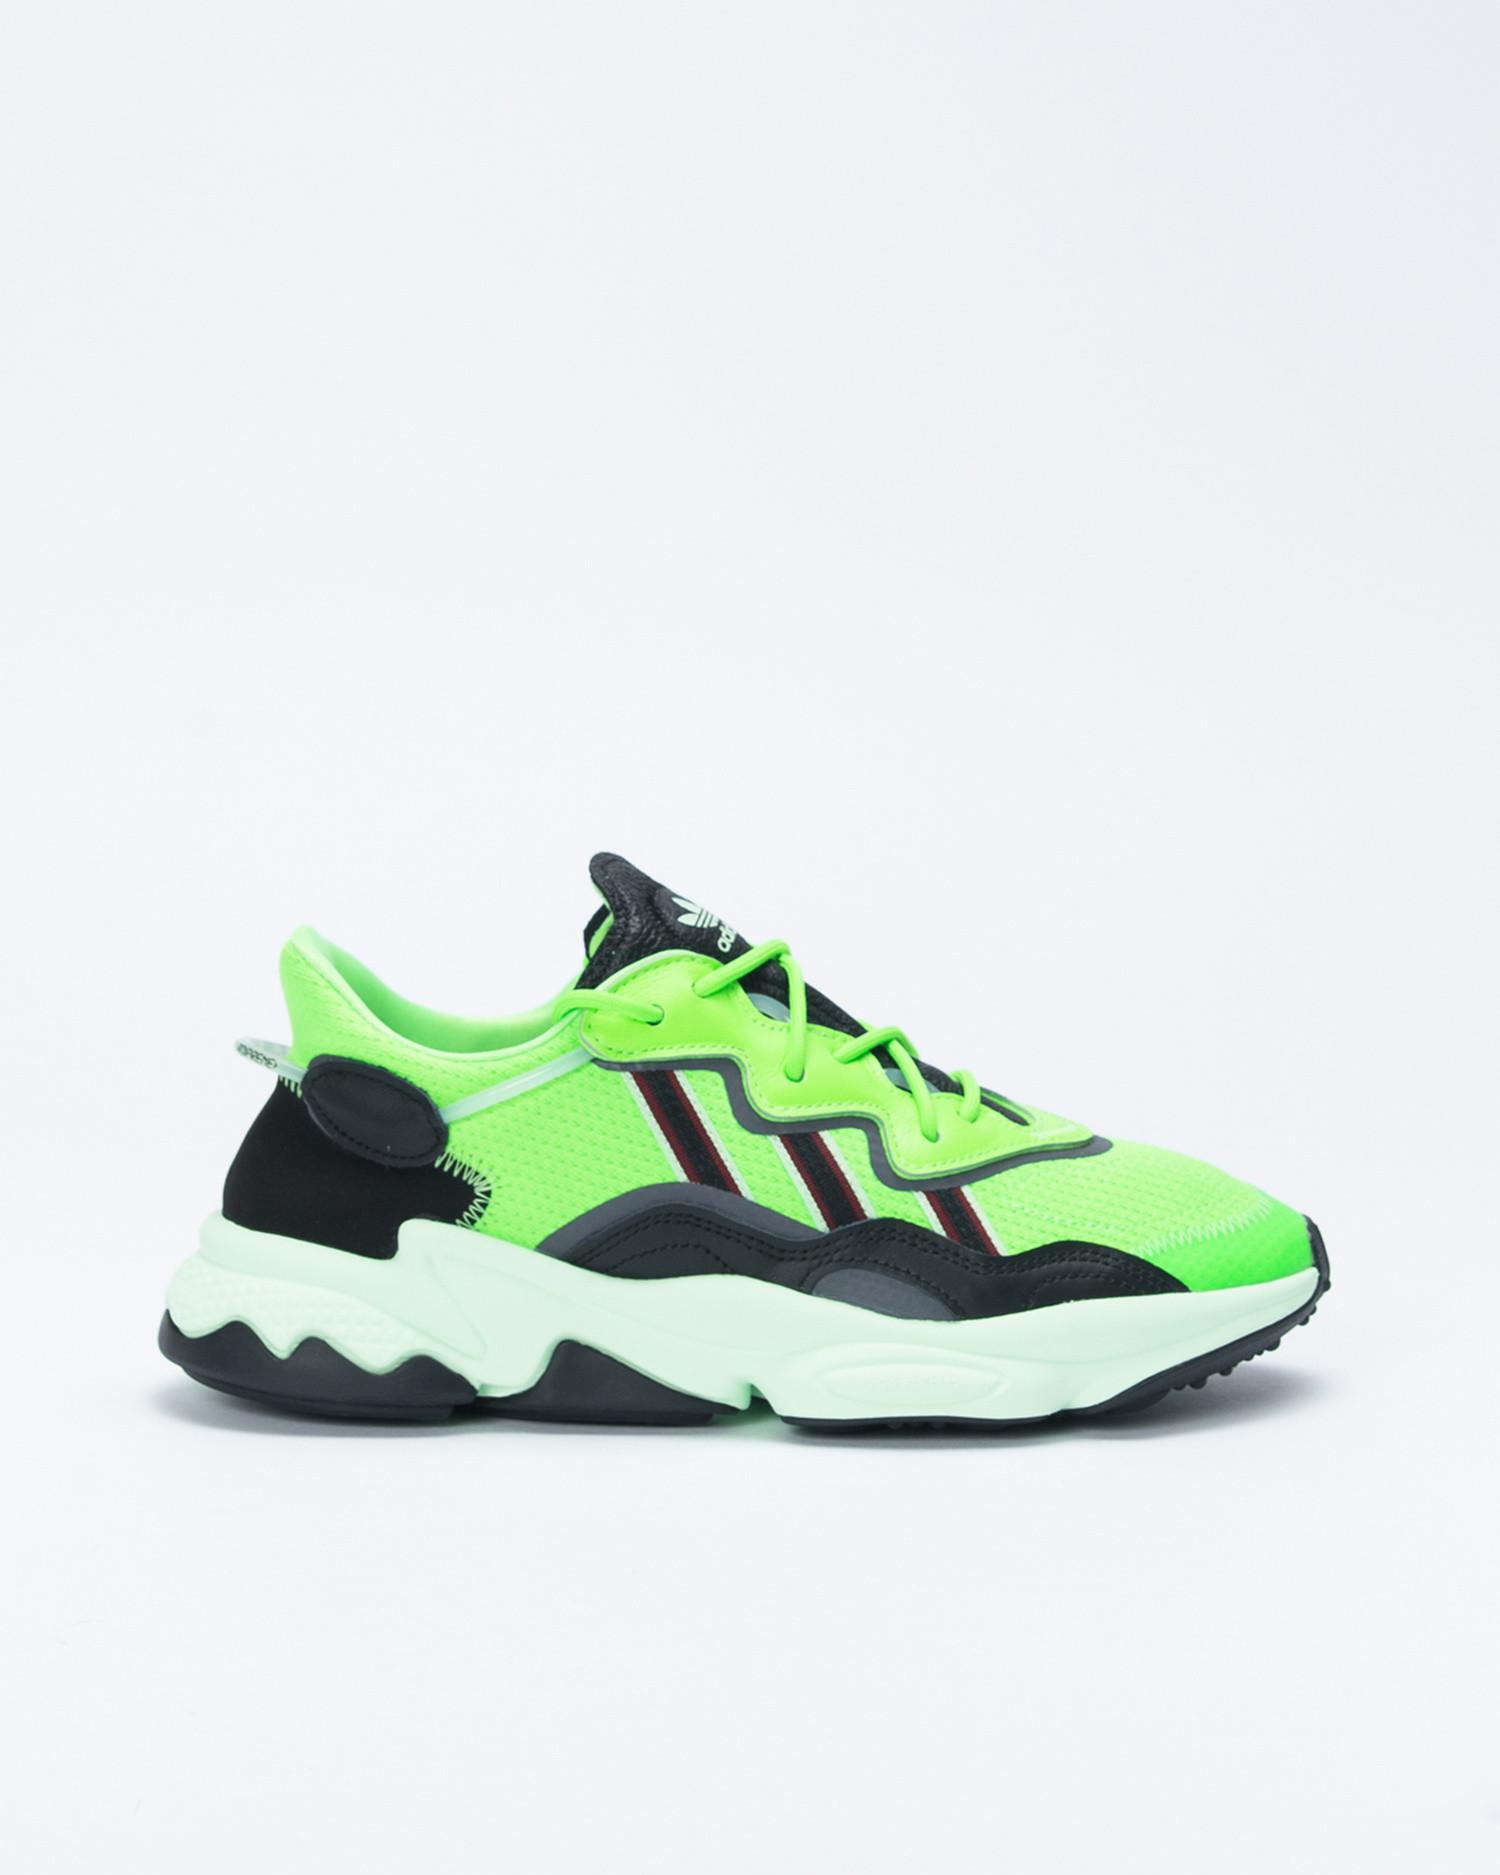 adidas Ozweego Sgreen/Cblack/Glogrn